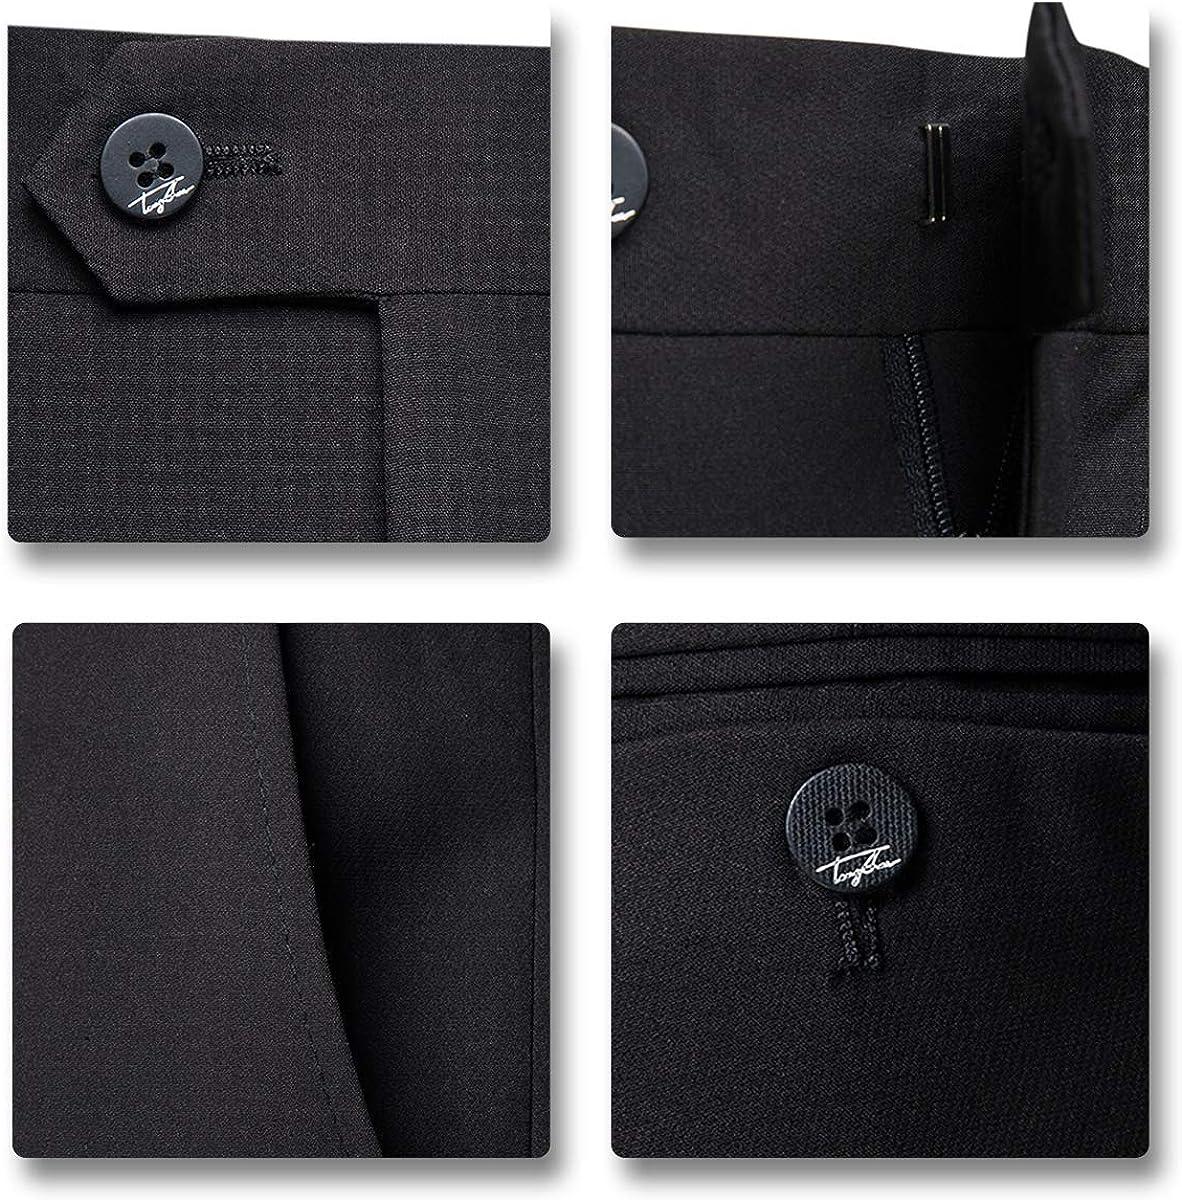 AOWOFS Mens Suits 2 Piece Slim Fit Casual Formal Wedding Tuxedo Suit for Men Blazer Jacket/&Trouser